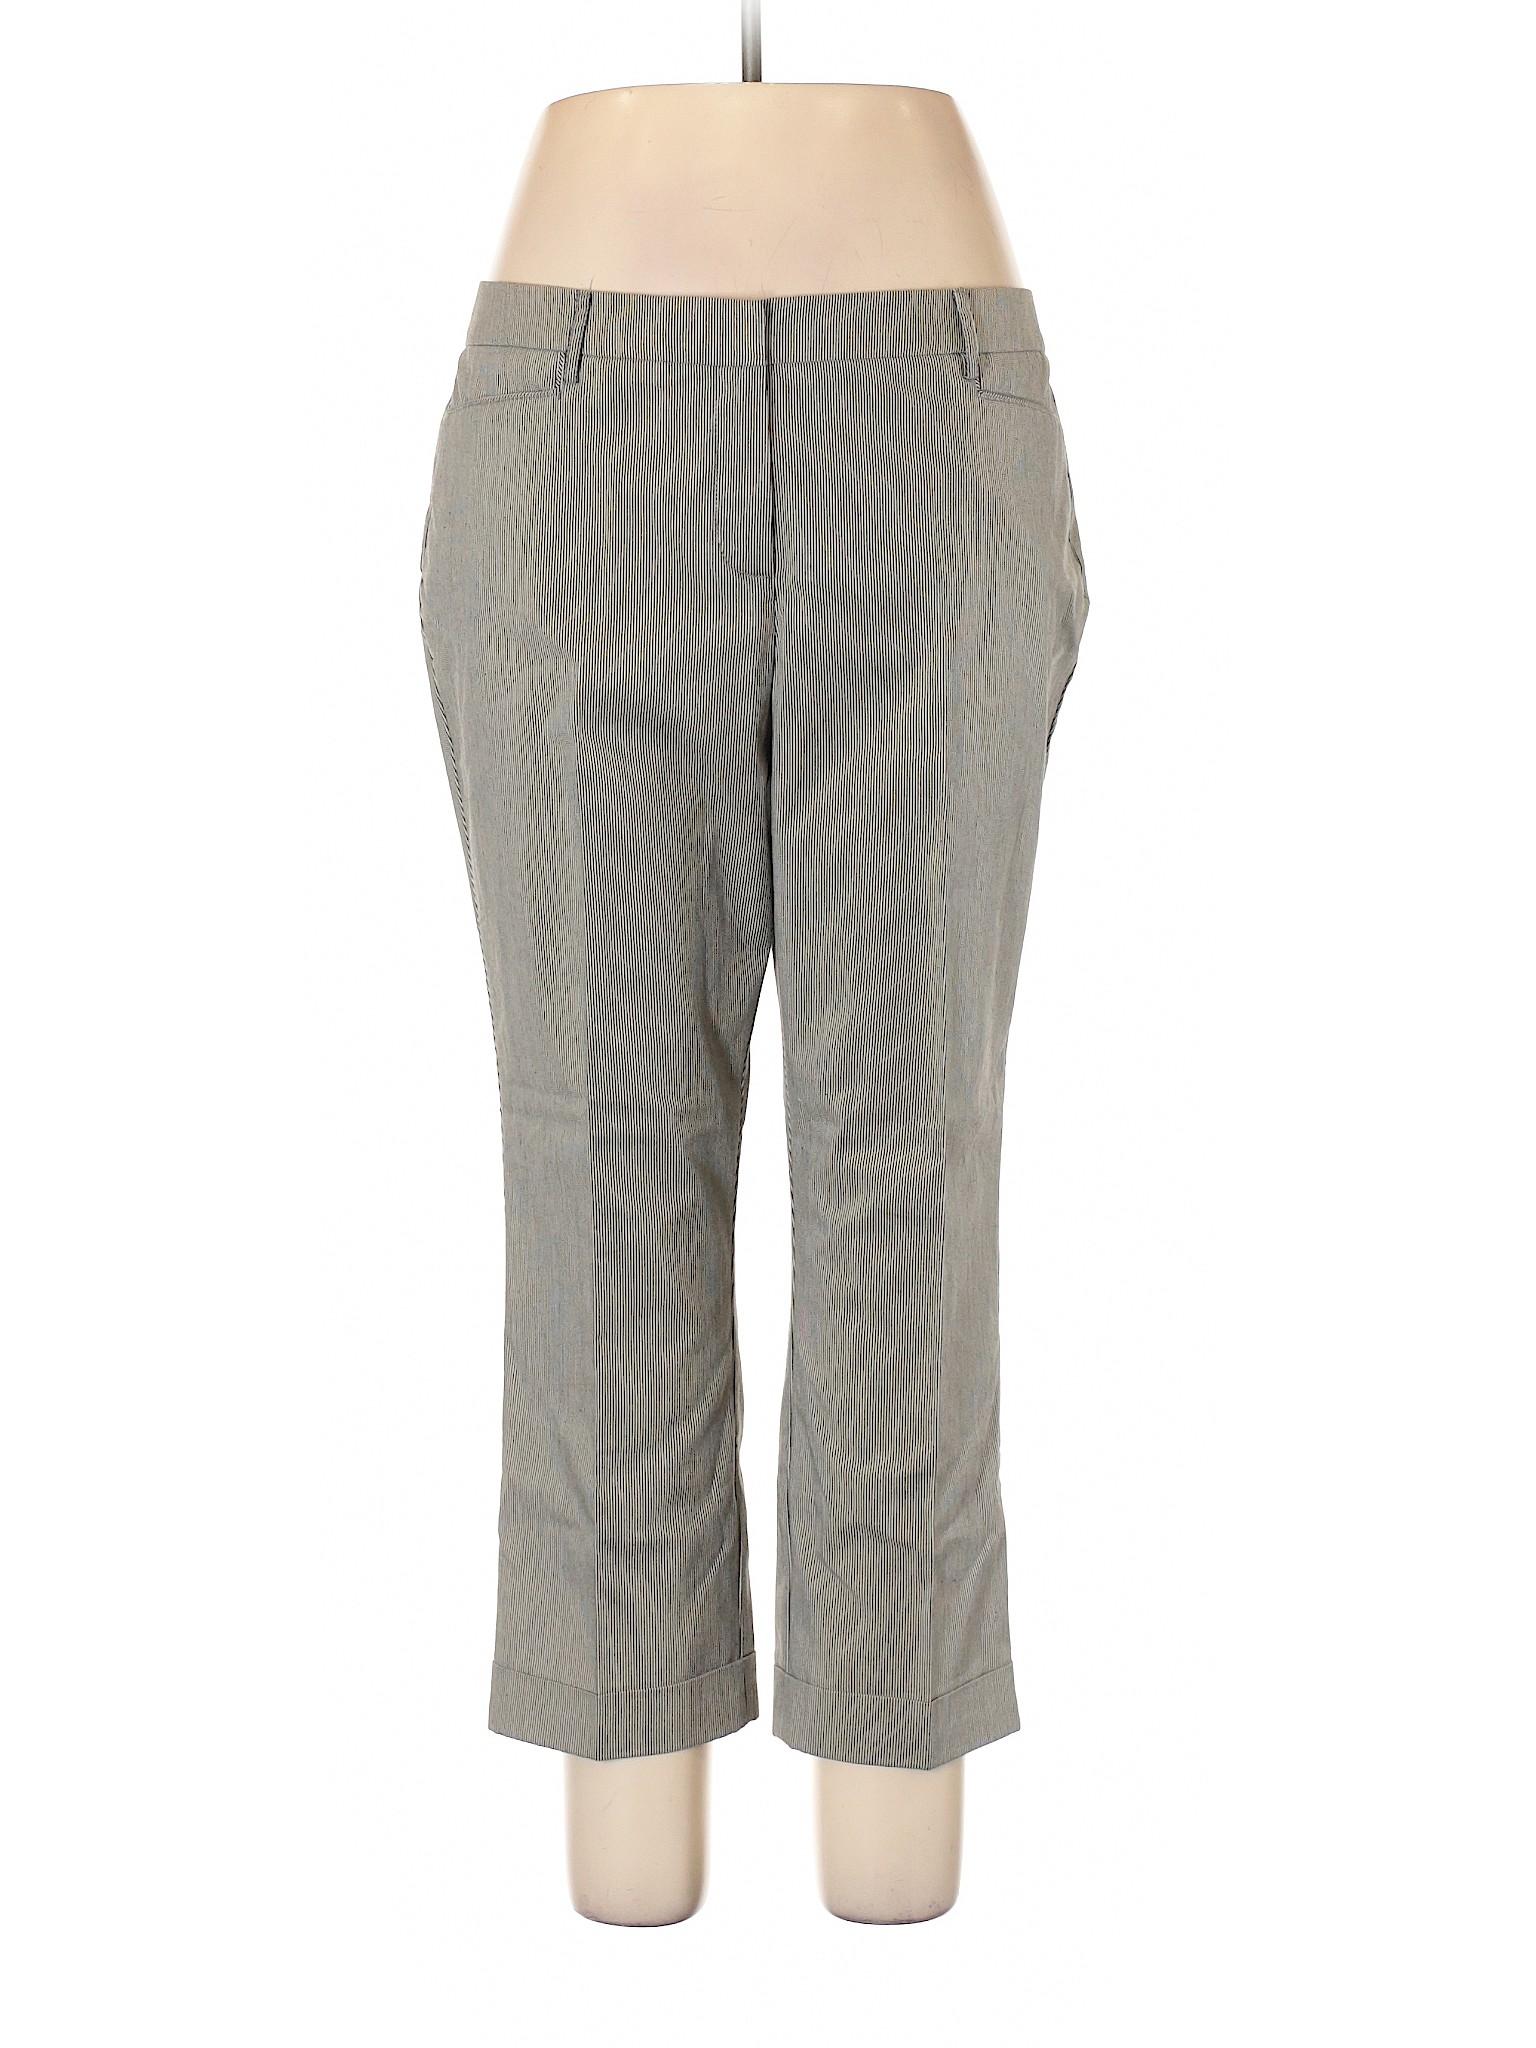 Pants New Leisure 7th Avenue amp; Design Winter Casual Studio York Company x6pFwqH6Z